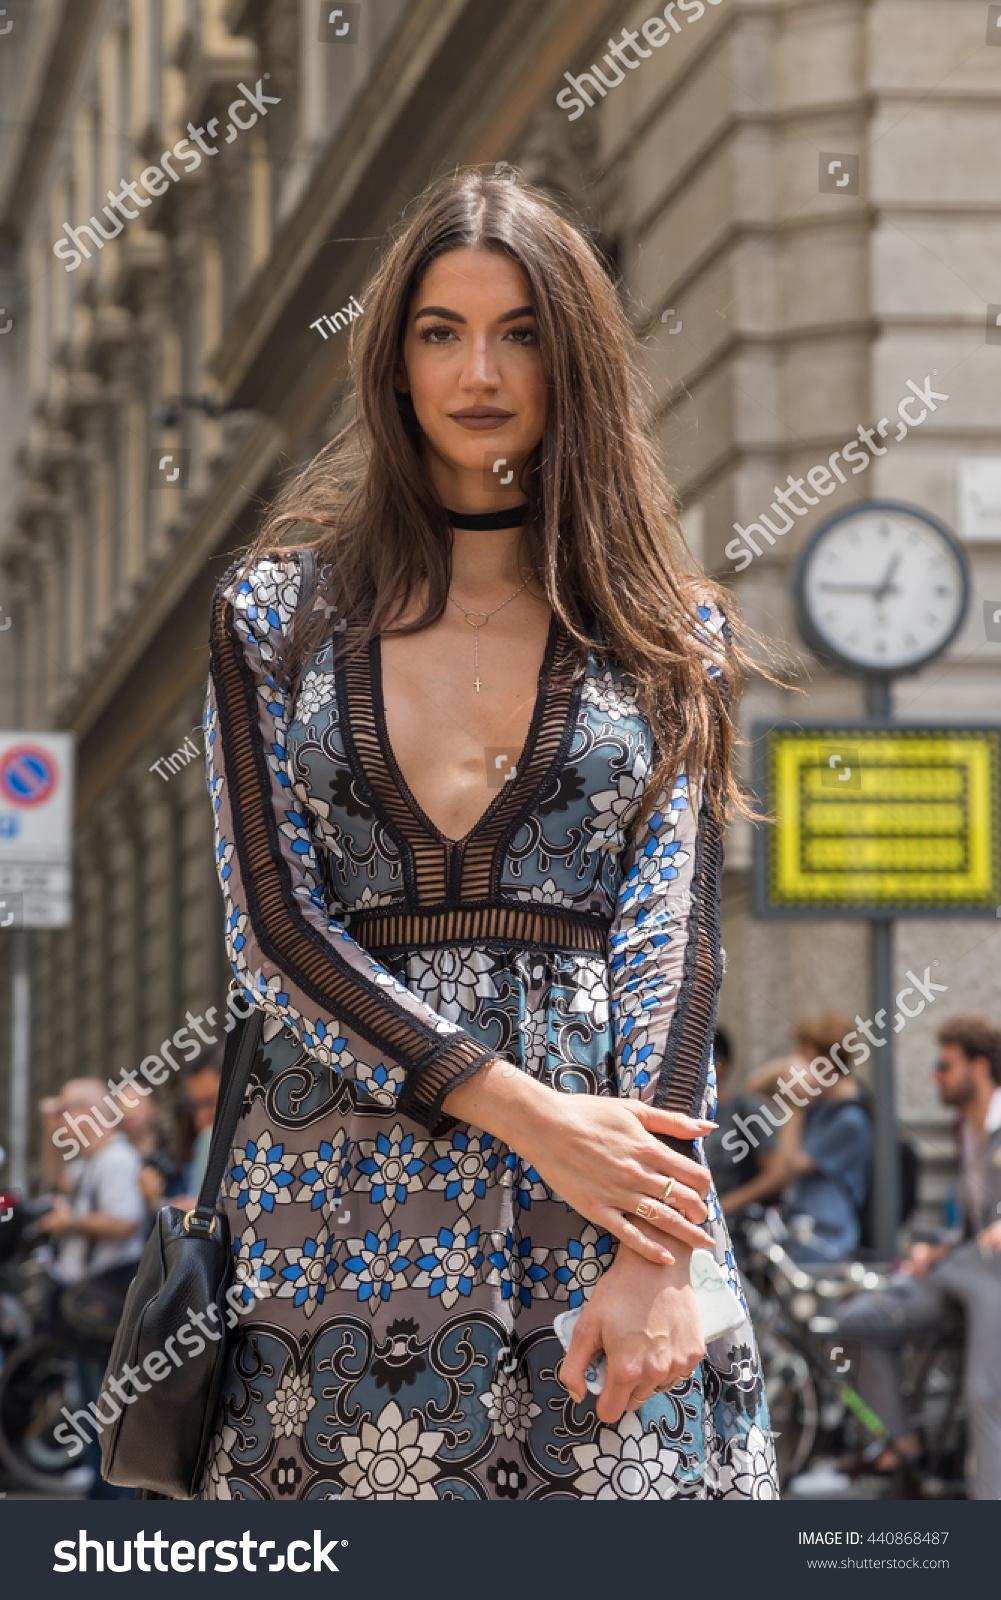 Milan Italy June 19 Fashionable Woman Stock Photo ...